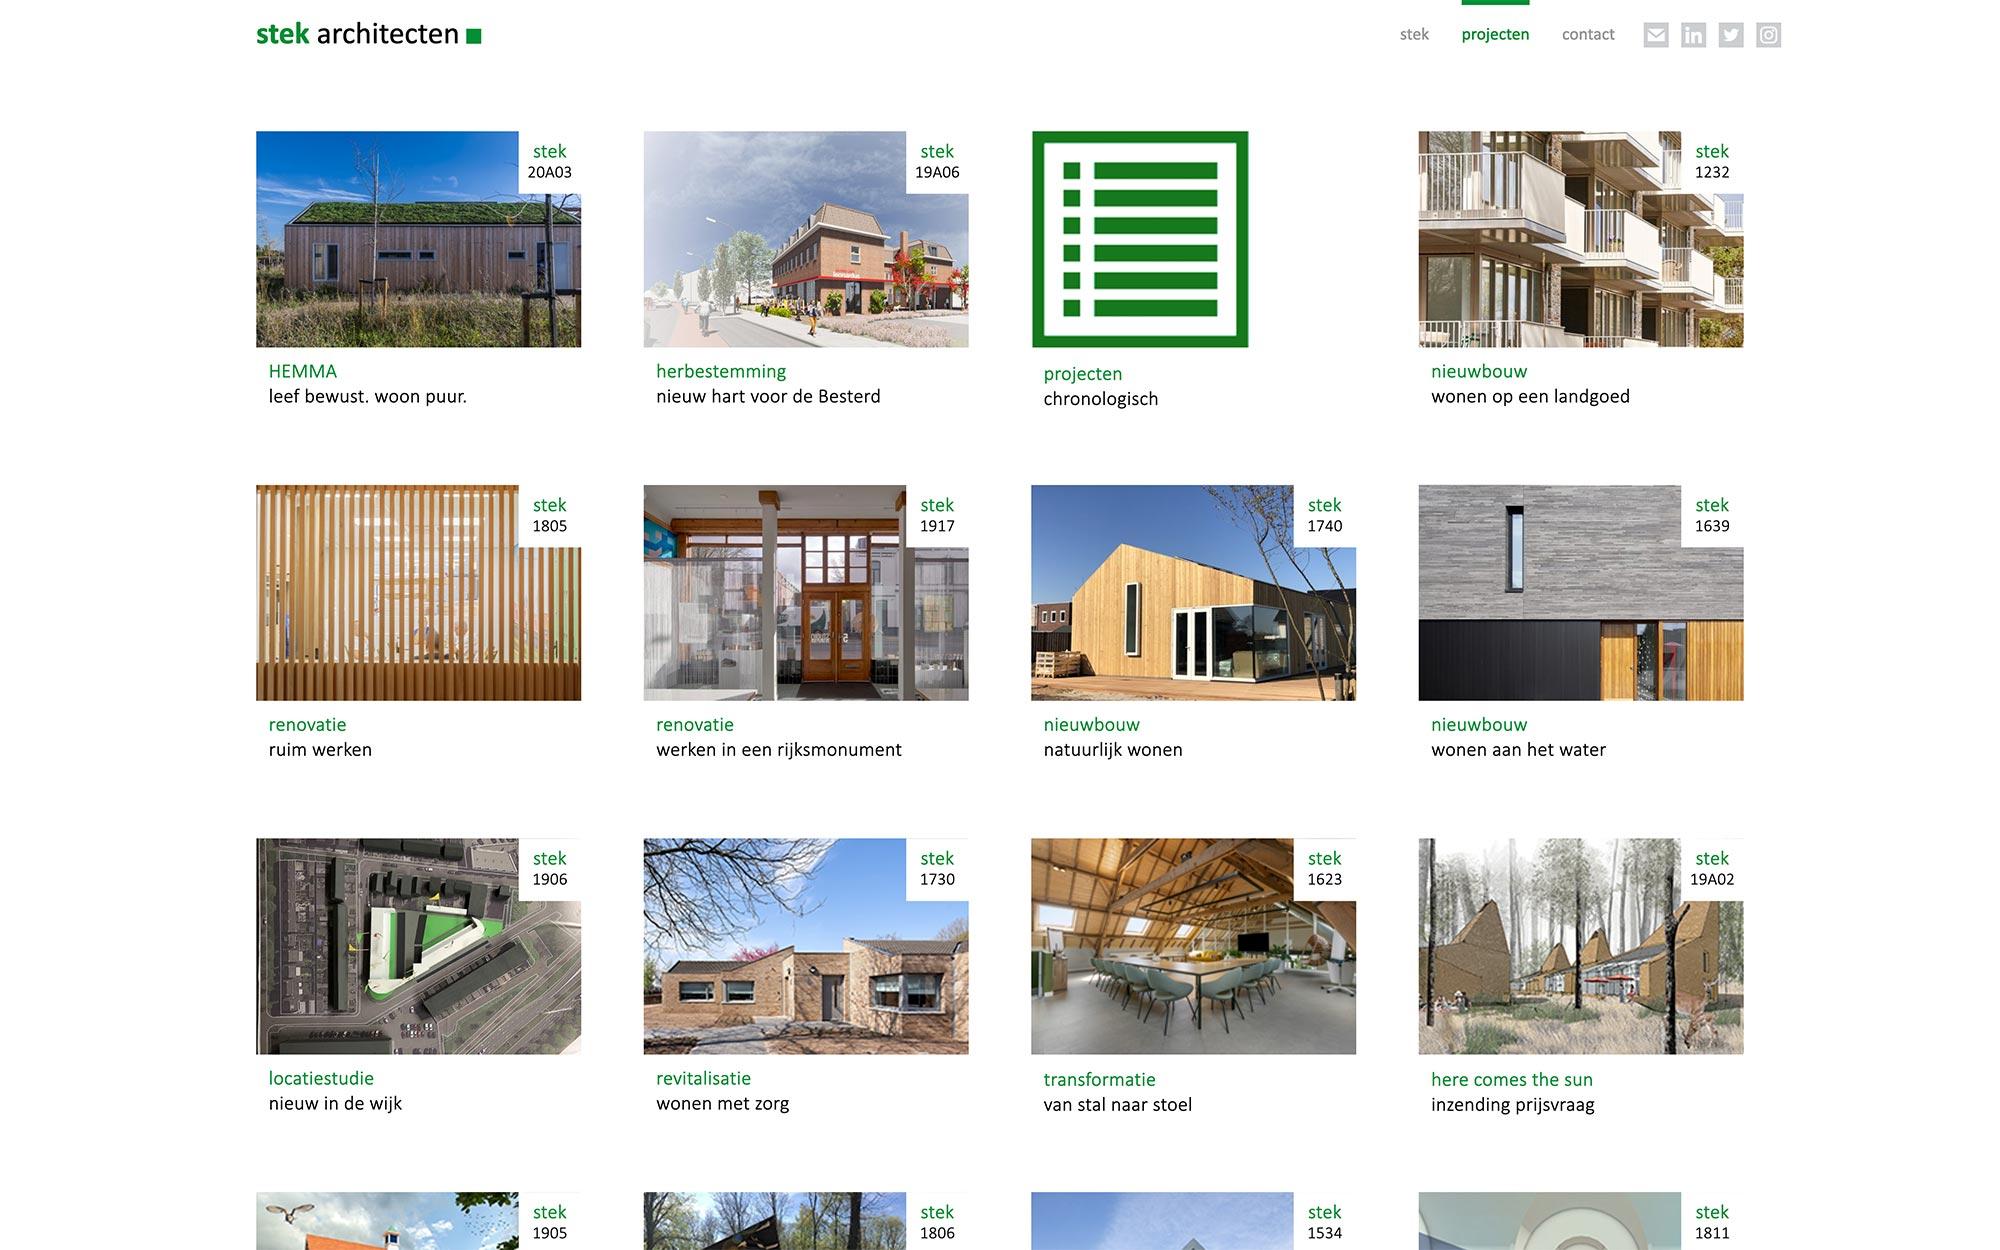 stek architecten website JAgd ontwerp 2